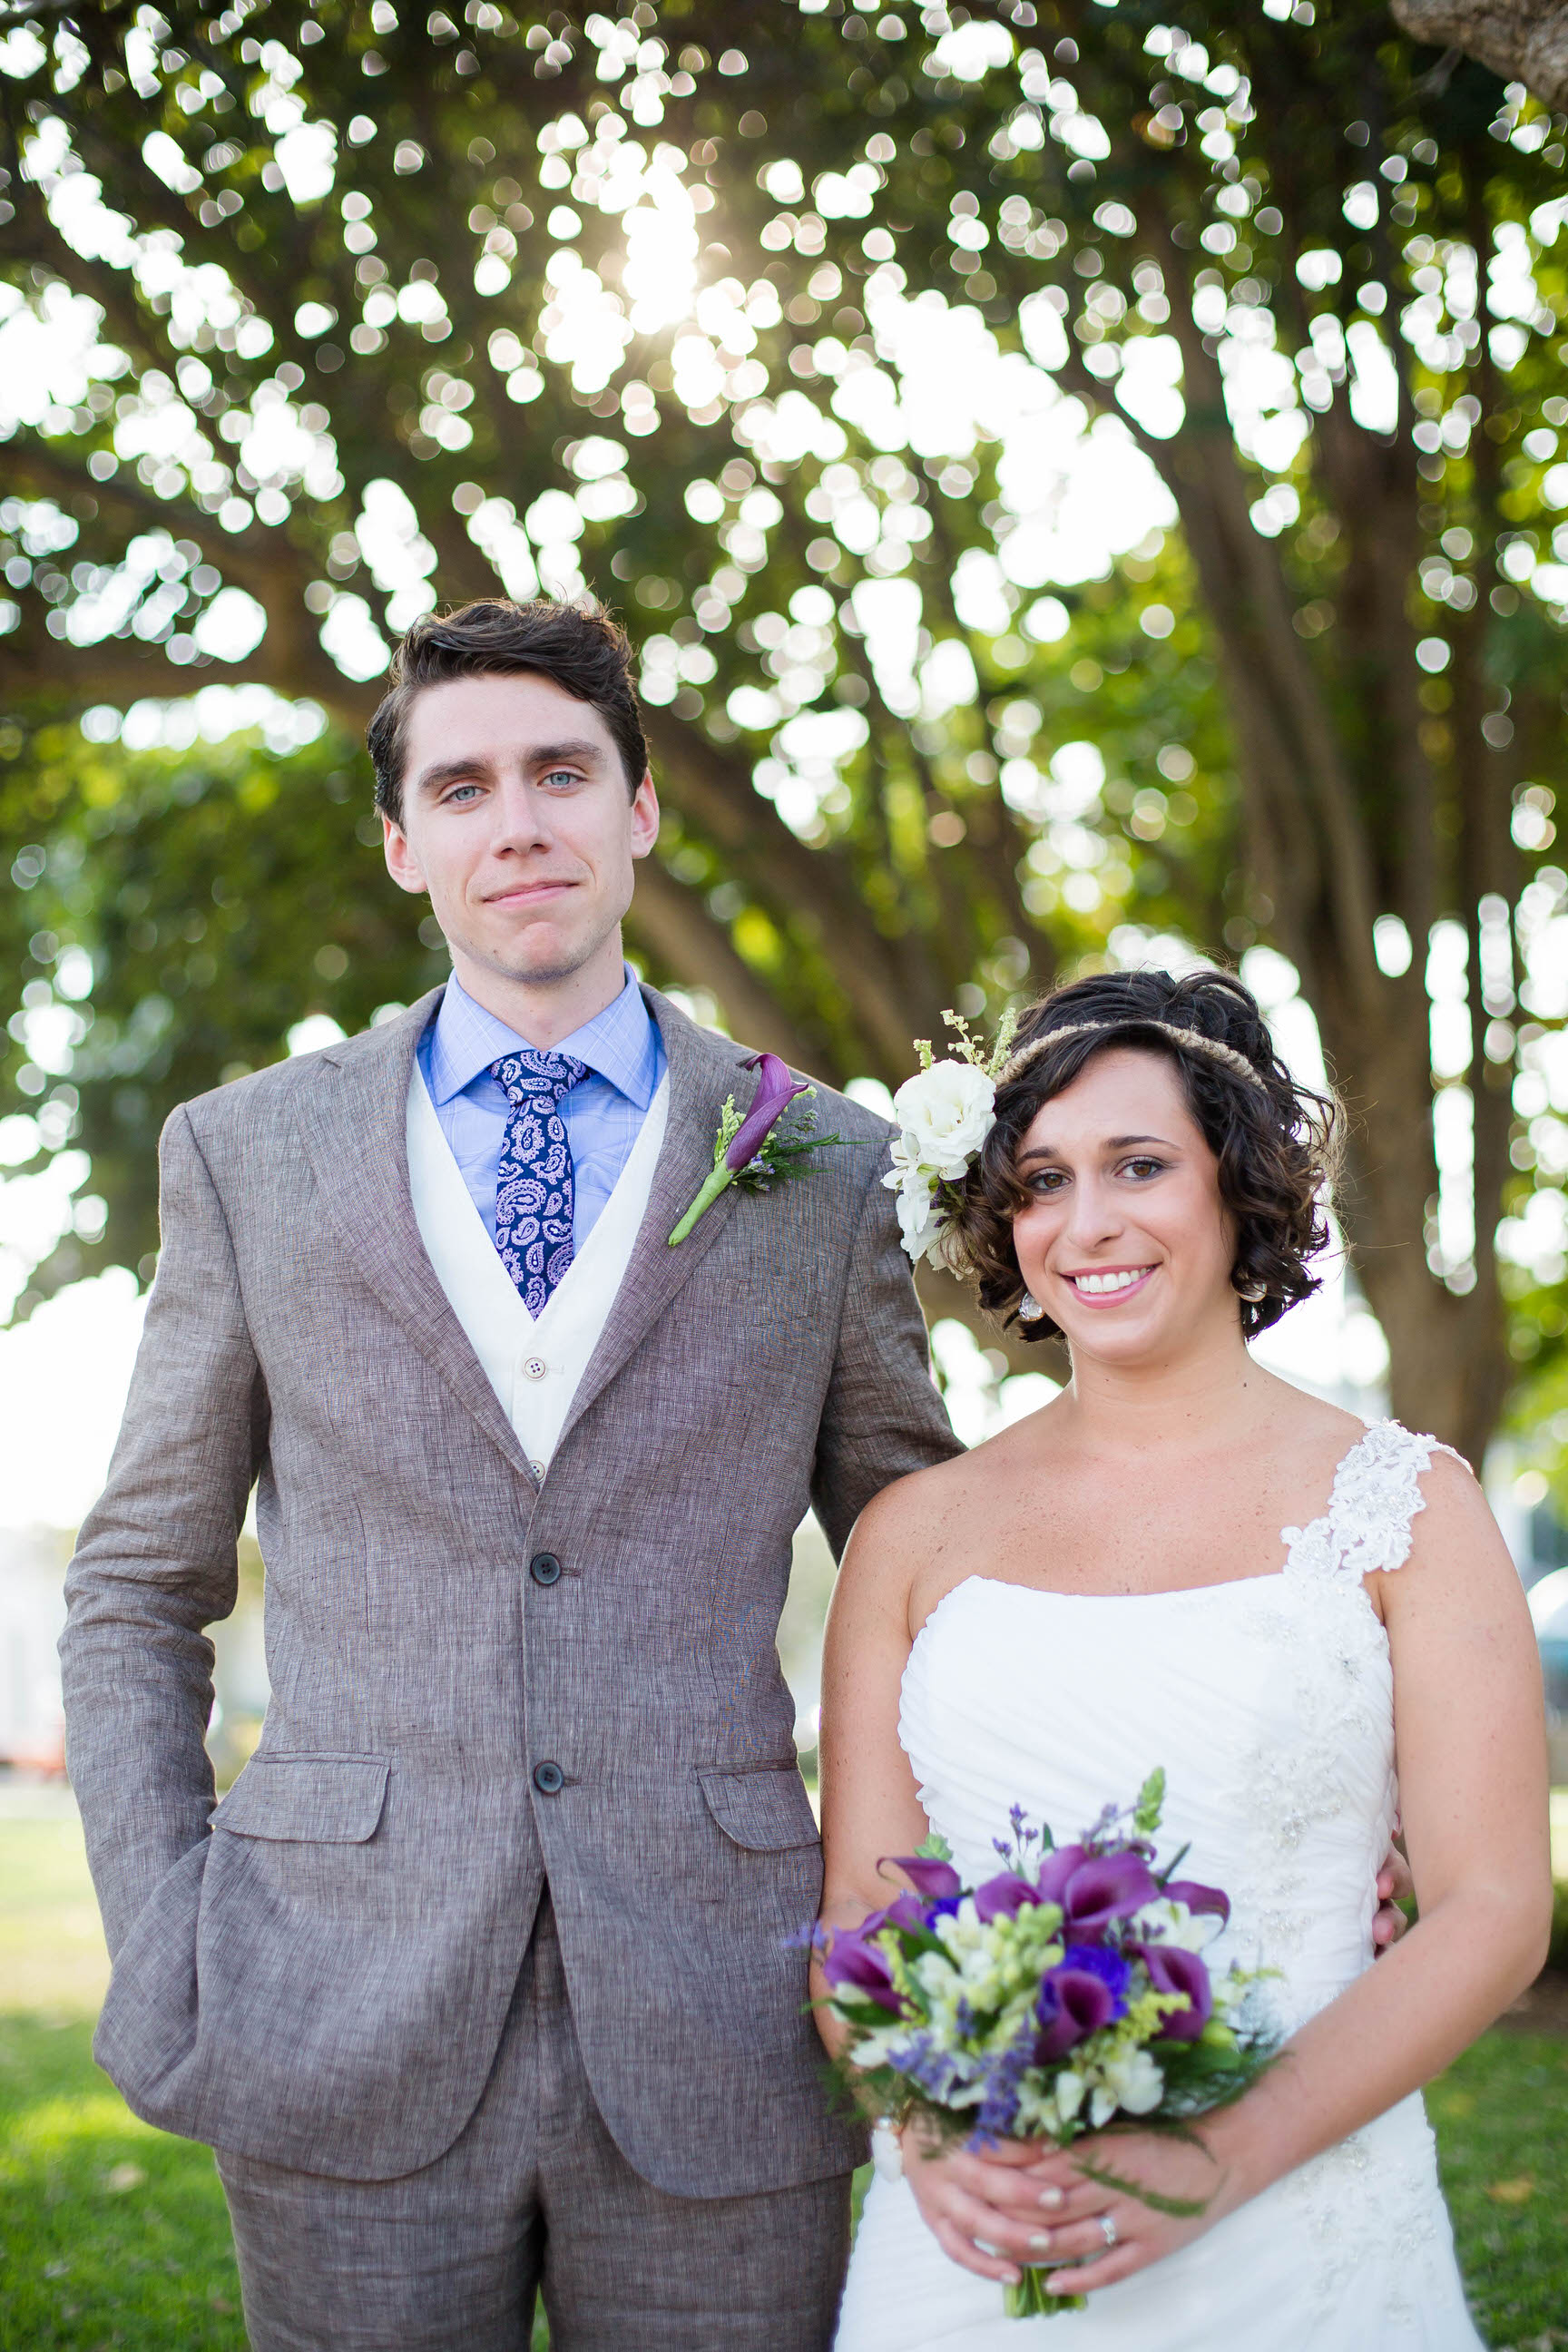 bride-groom-destination-wedding-portraits-tiny-house-photo.jpg